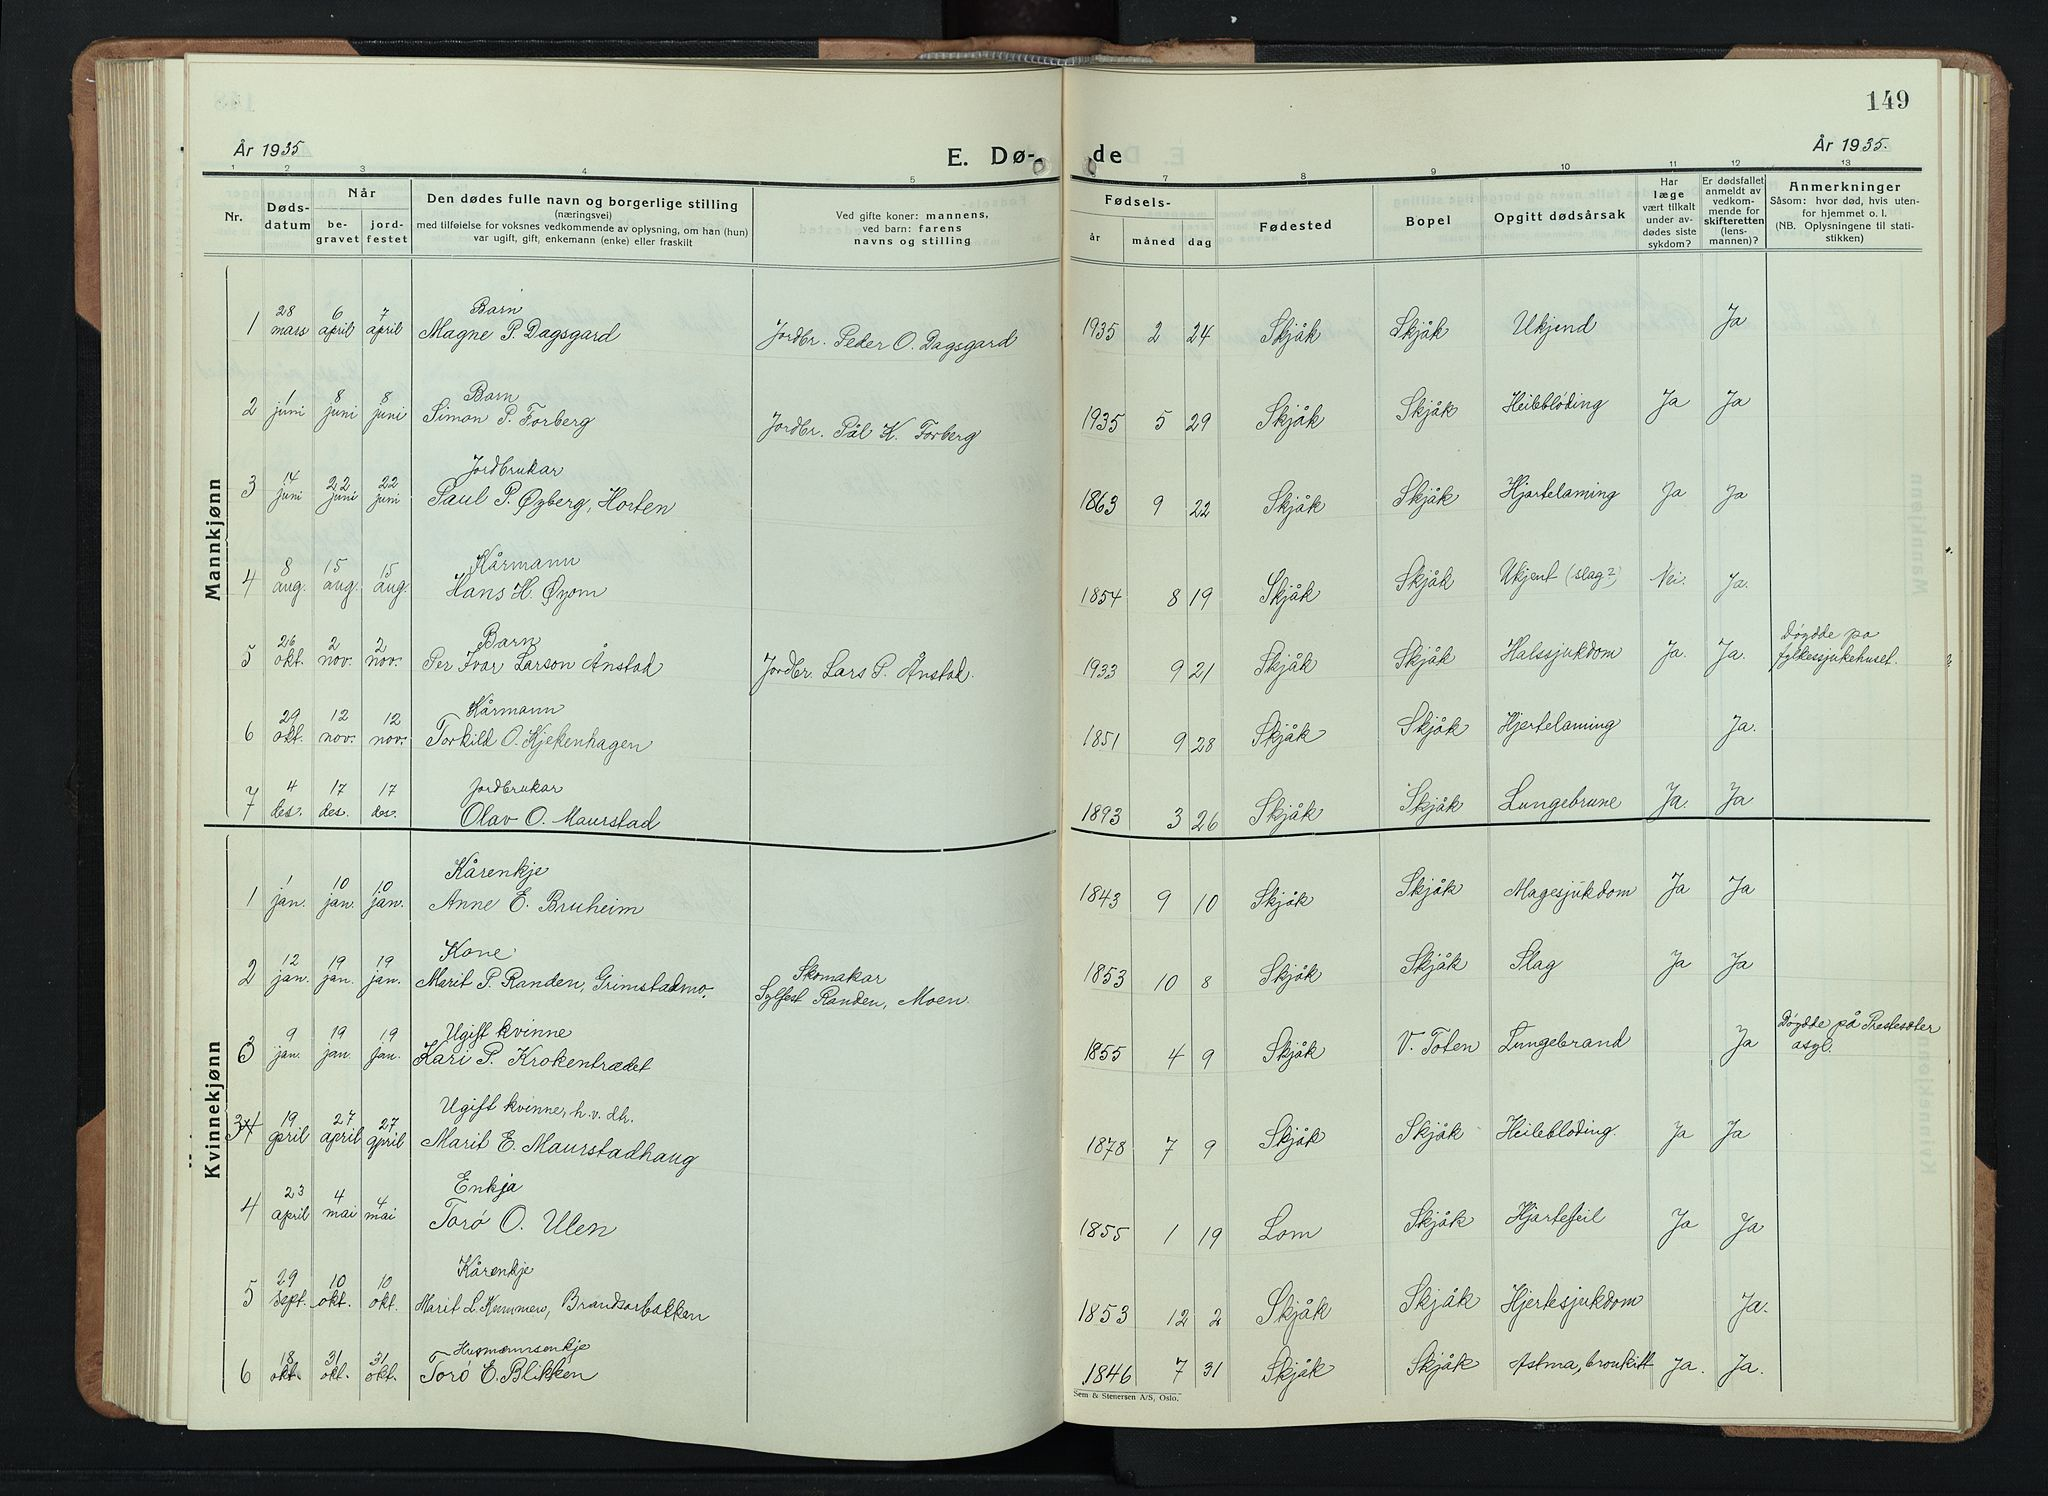 SAH, Skjåk prestekontor, Klokkerbok nr. 6, 1933-1954, s. 149